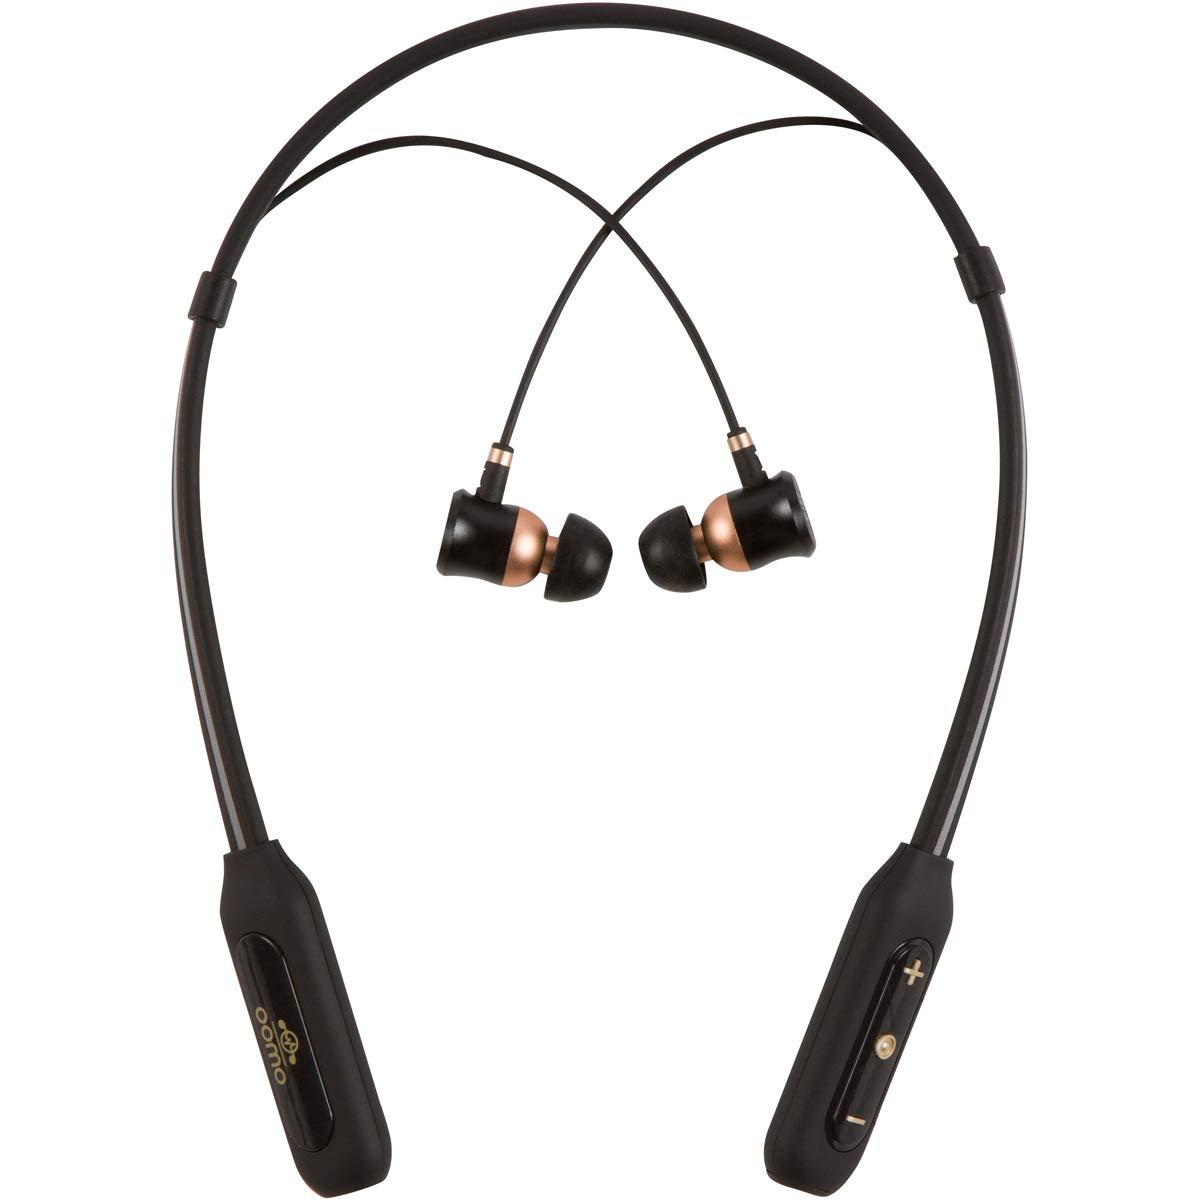 Oomo 3D 5.1 Surround Sound Bluetooth Earphones | Endorsed by Emmy Winning Audio Team I Noise Reduction I Gaming I ASMR I Music I Deep Bass I Wireless